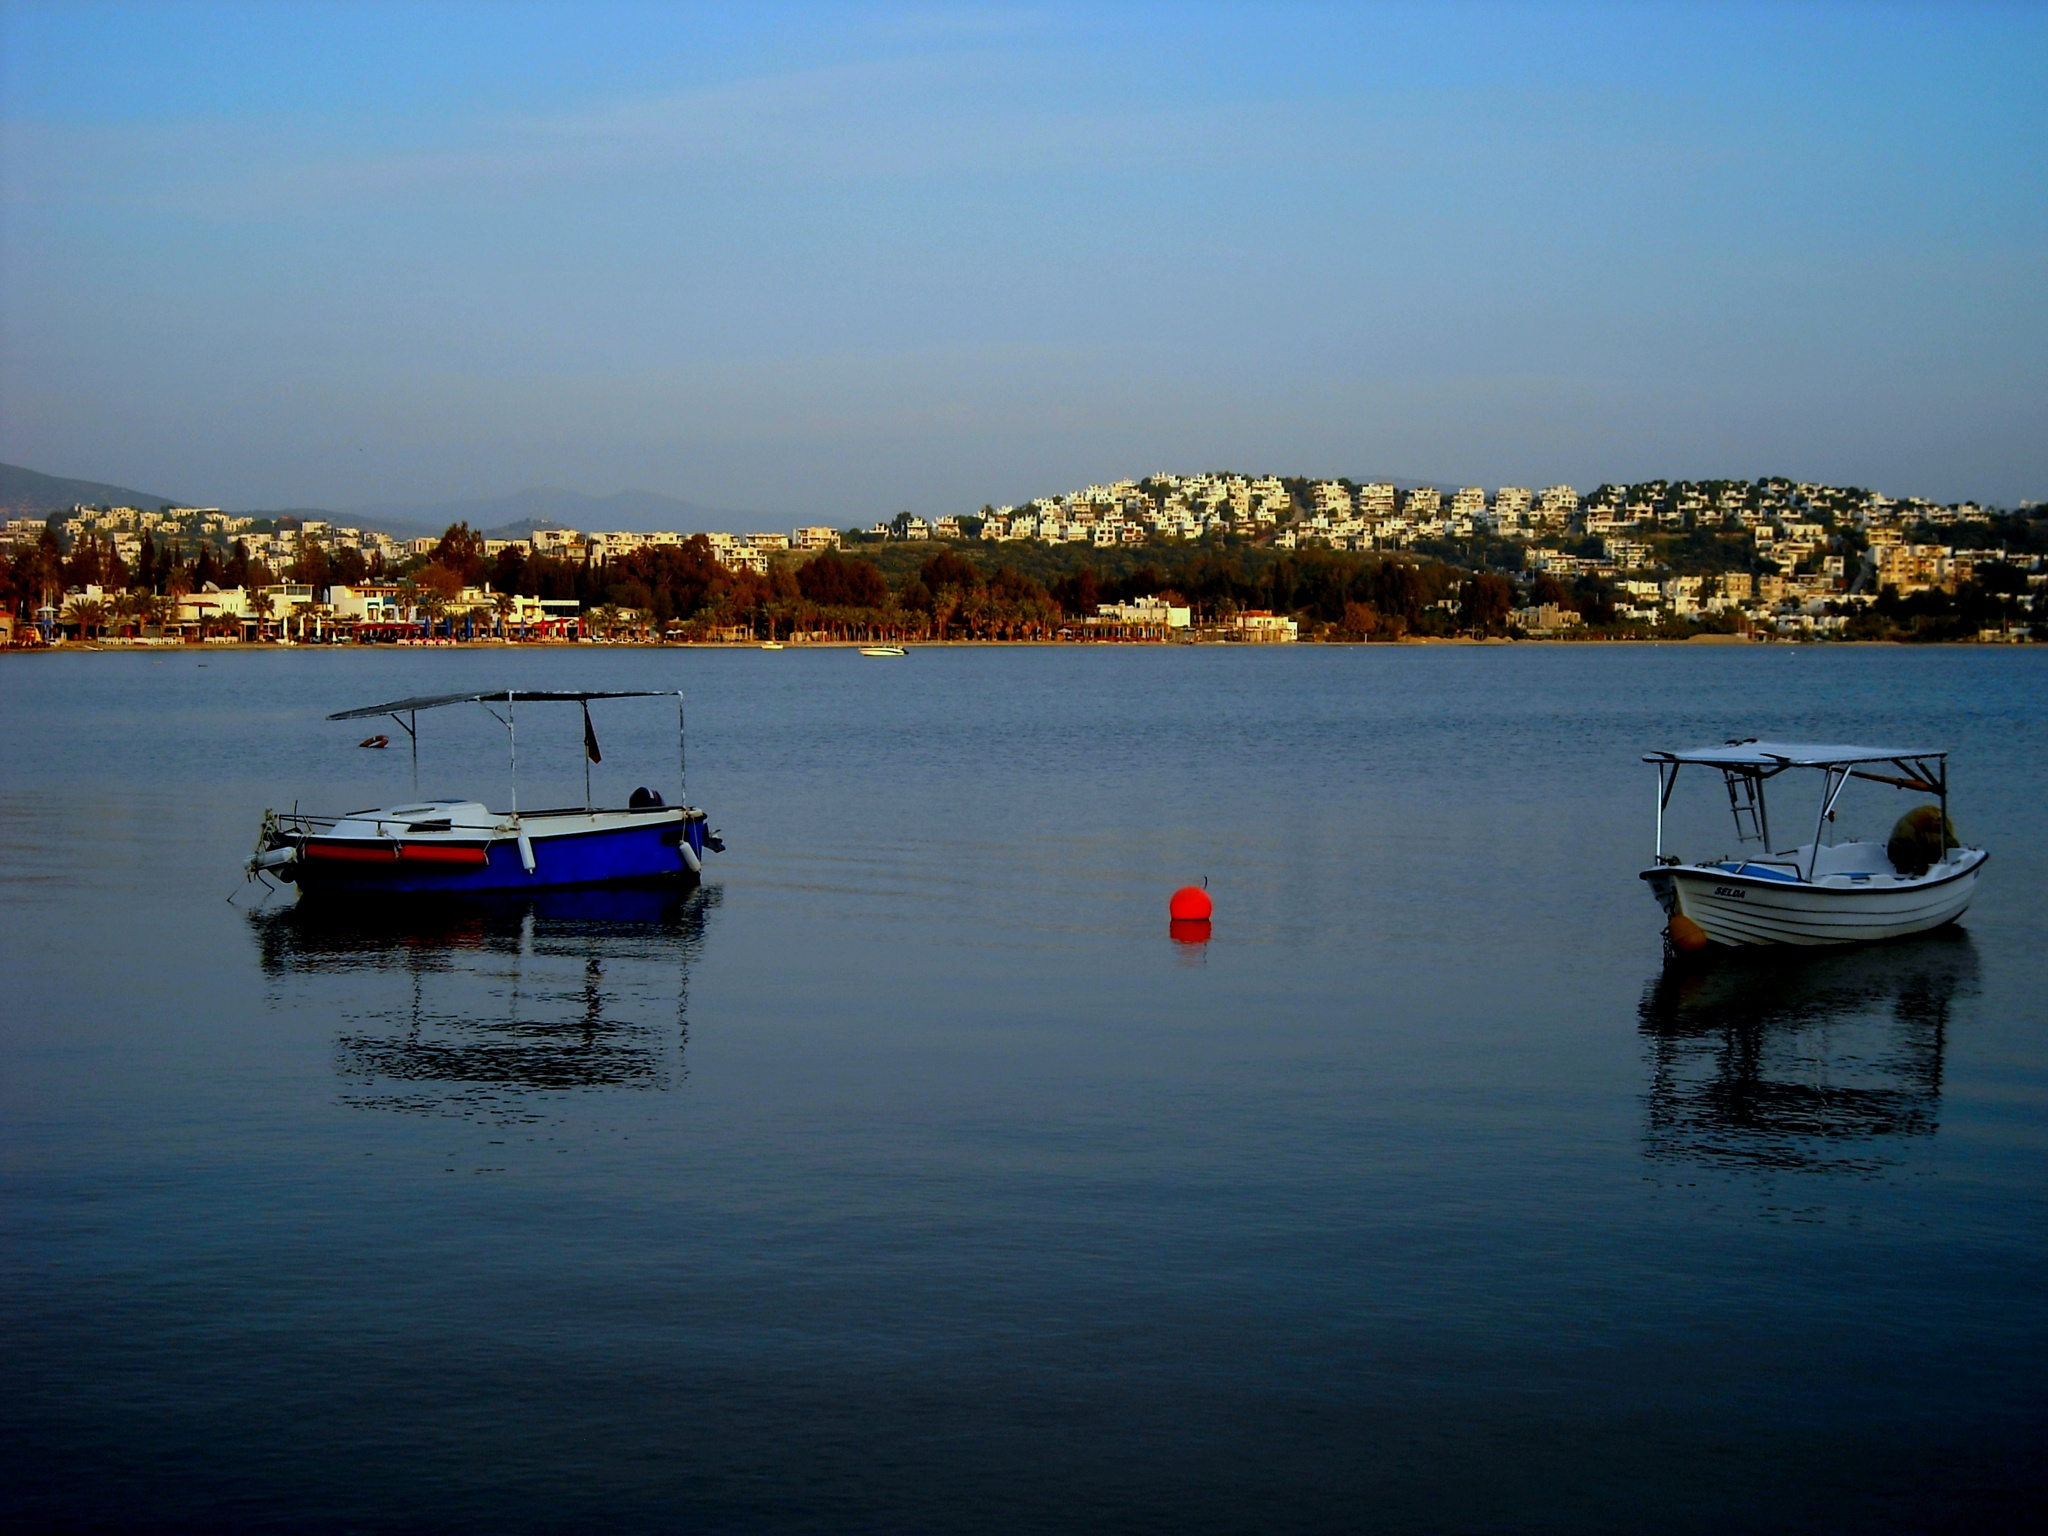 EARLY EVENING VIEW OF BITEZ BAY, BODRUM/TURKEY by Akin Saner